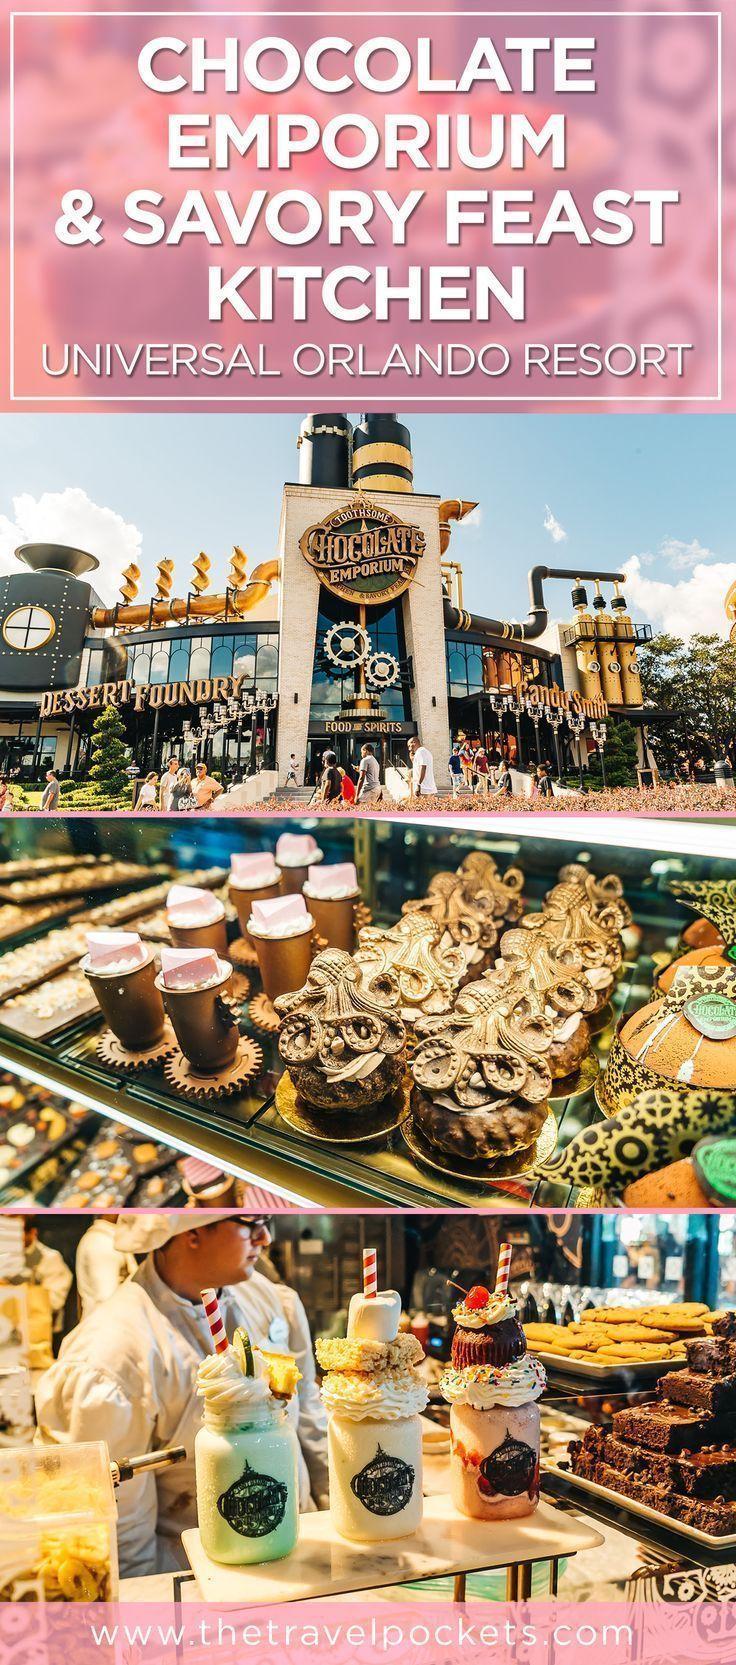 Try The Awesome Chocolate Factory In Orlando At Toothsome Chocolate Emporium Travel Pockets In 2020 Orlando Florida Vacation Universal Orlando Resort Universal Studios Orlando Trip